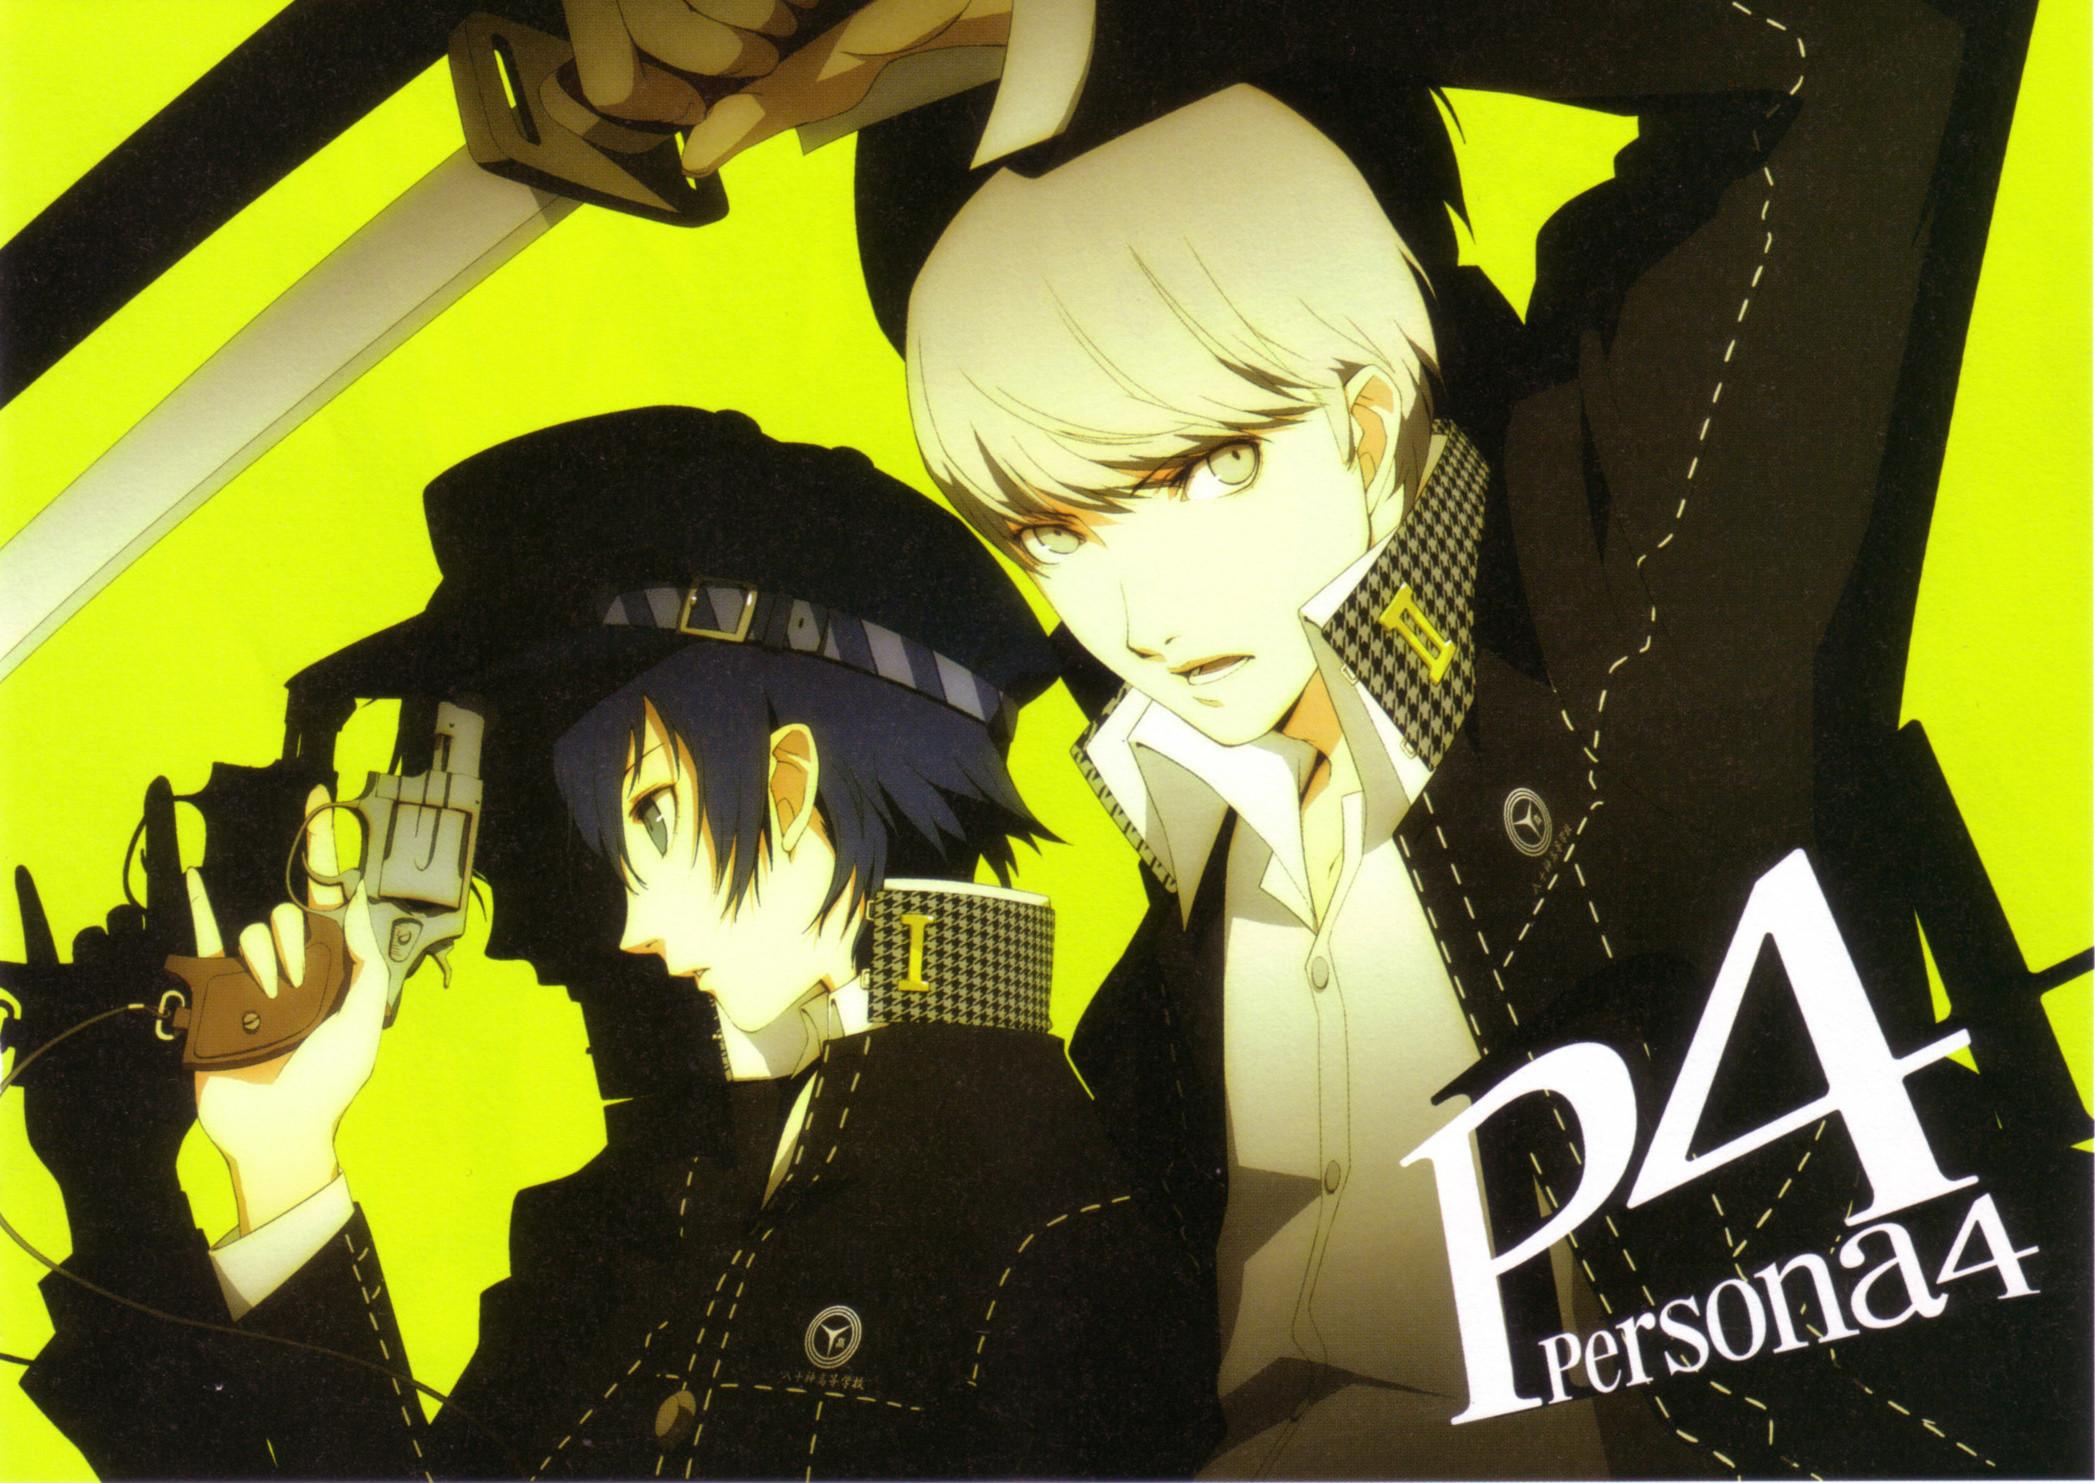 Persona 4 images Shin Megami Tensei PERSONA 4 HD wallpaper and background  photos